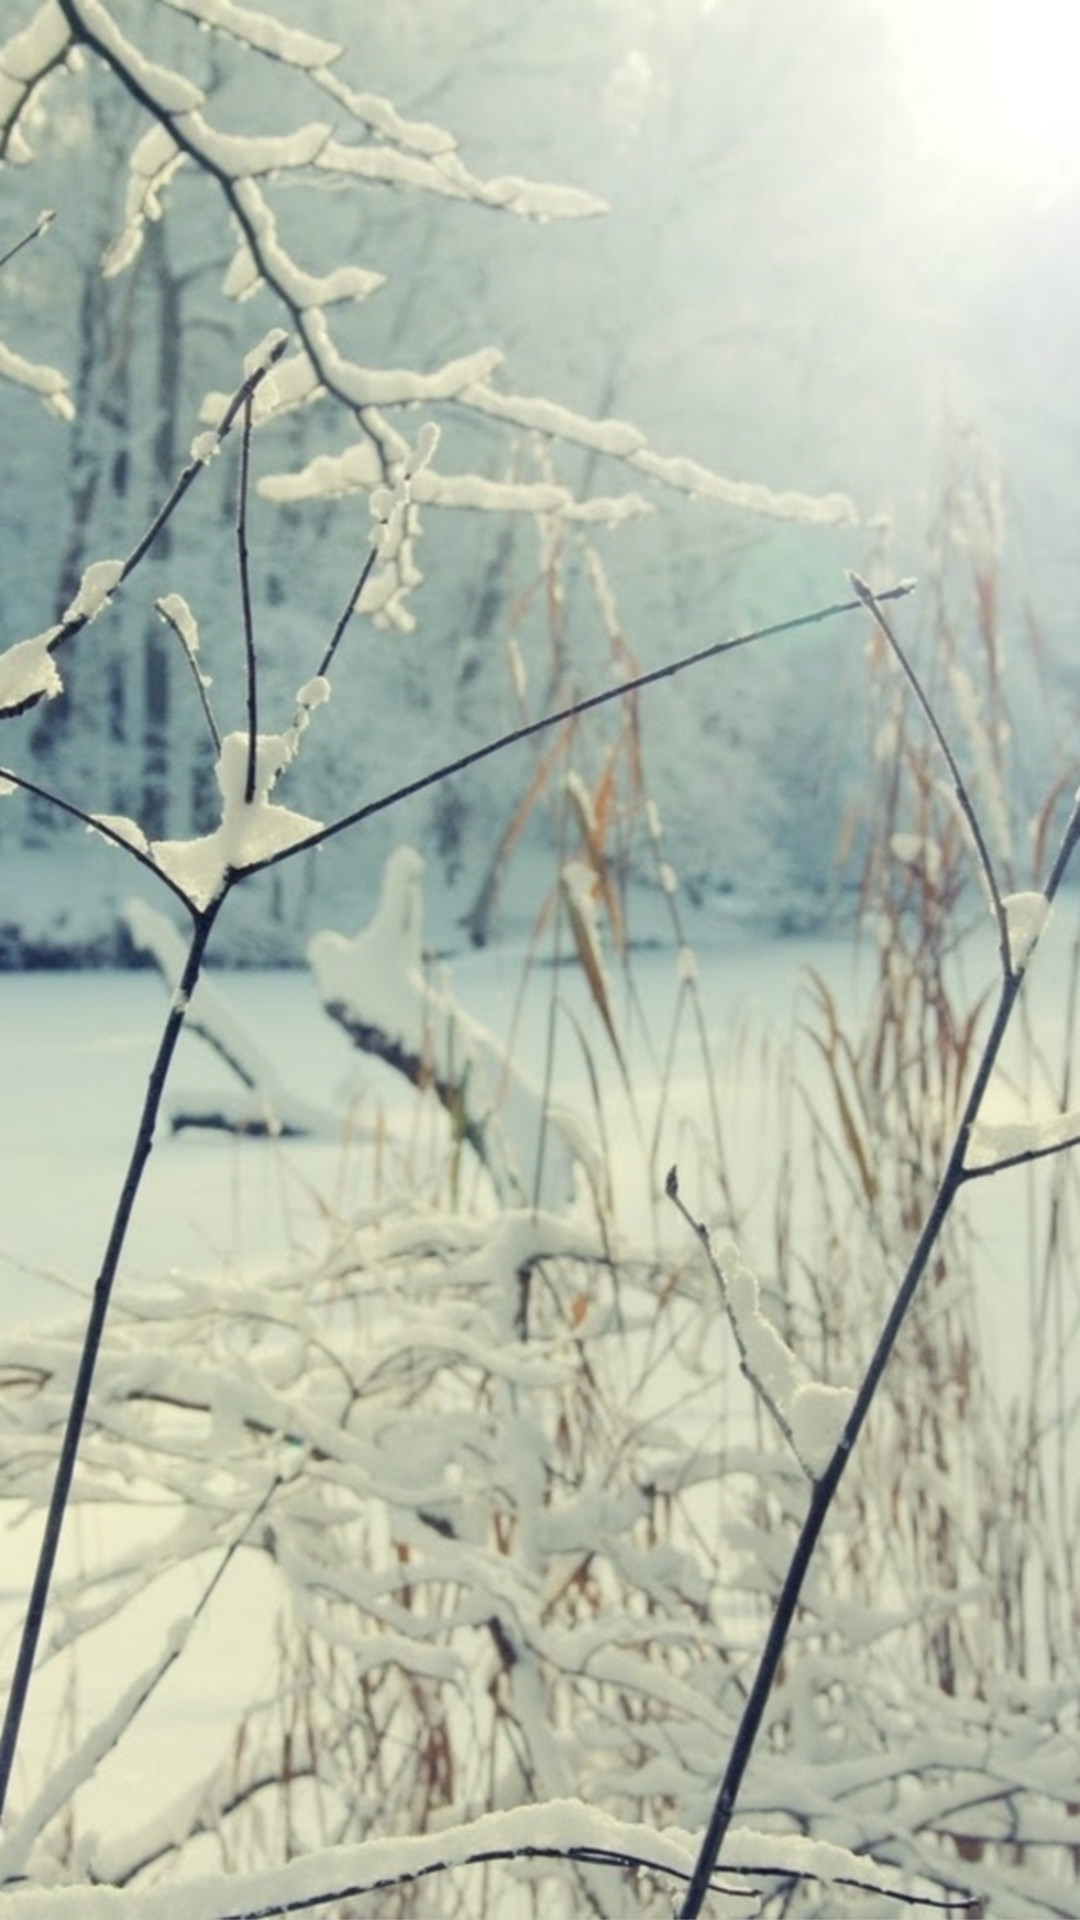 Nature Sunshine Winter Snowy Leafy Branch iPhone 8 wallpaper